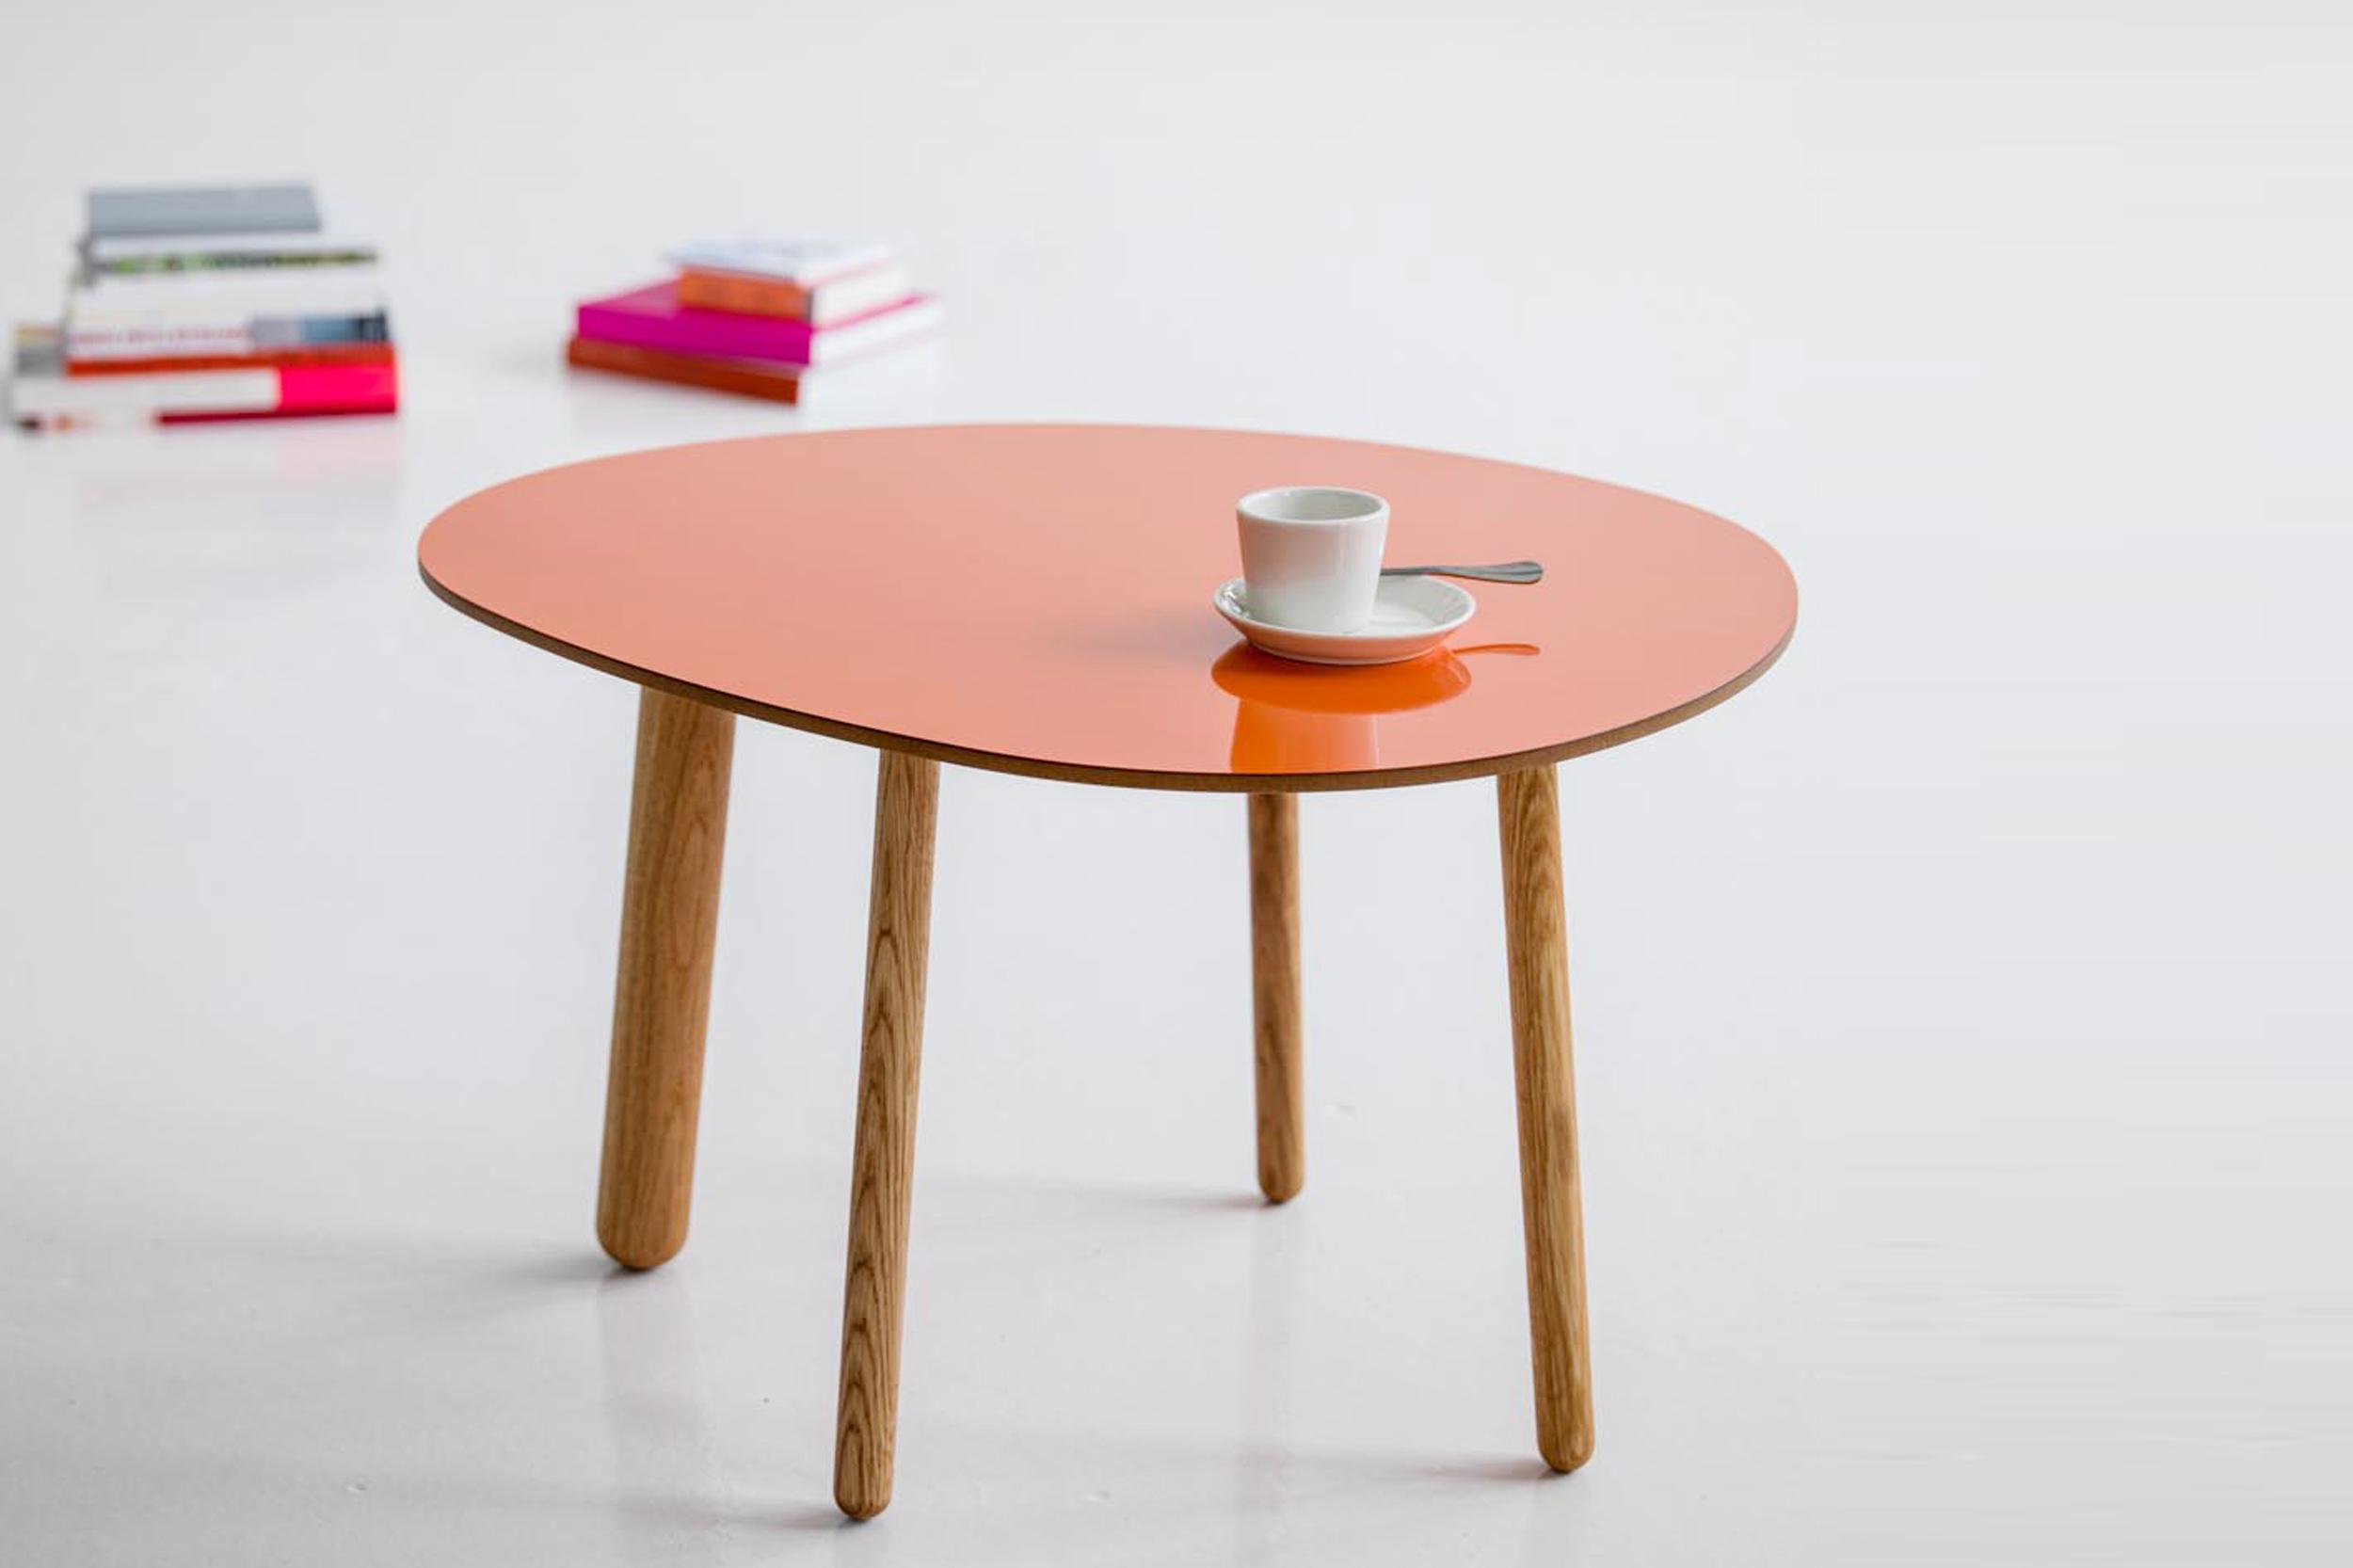 Morris coffee table model 1 in glossy orange